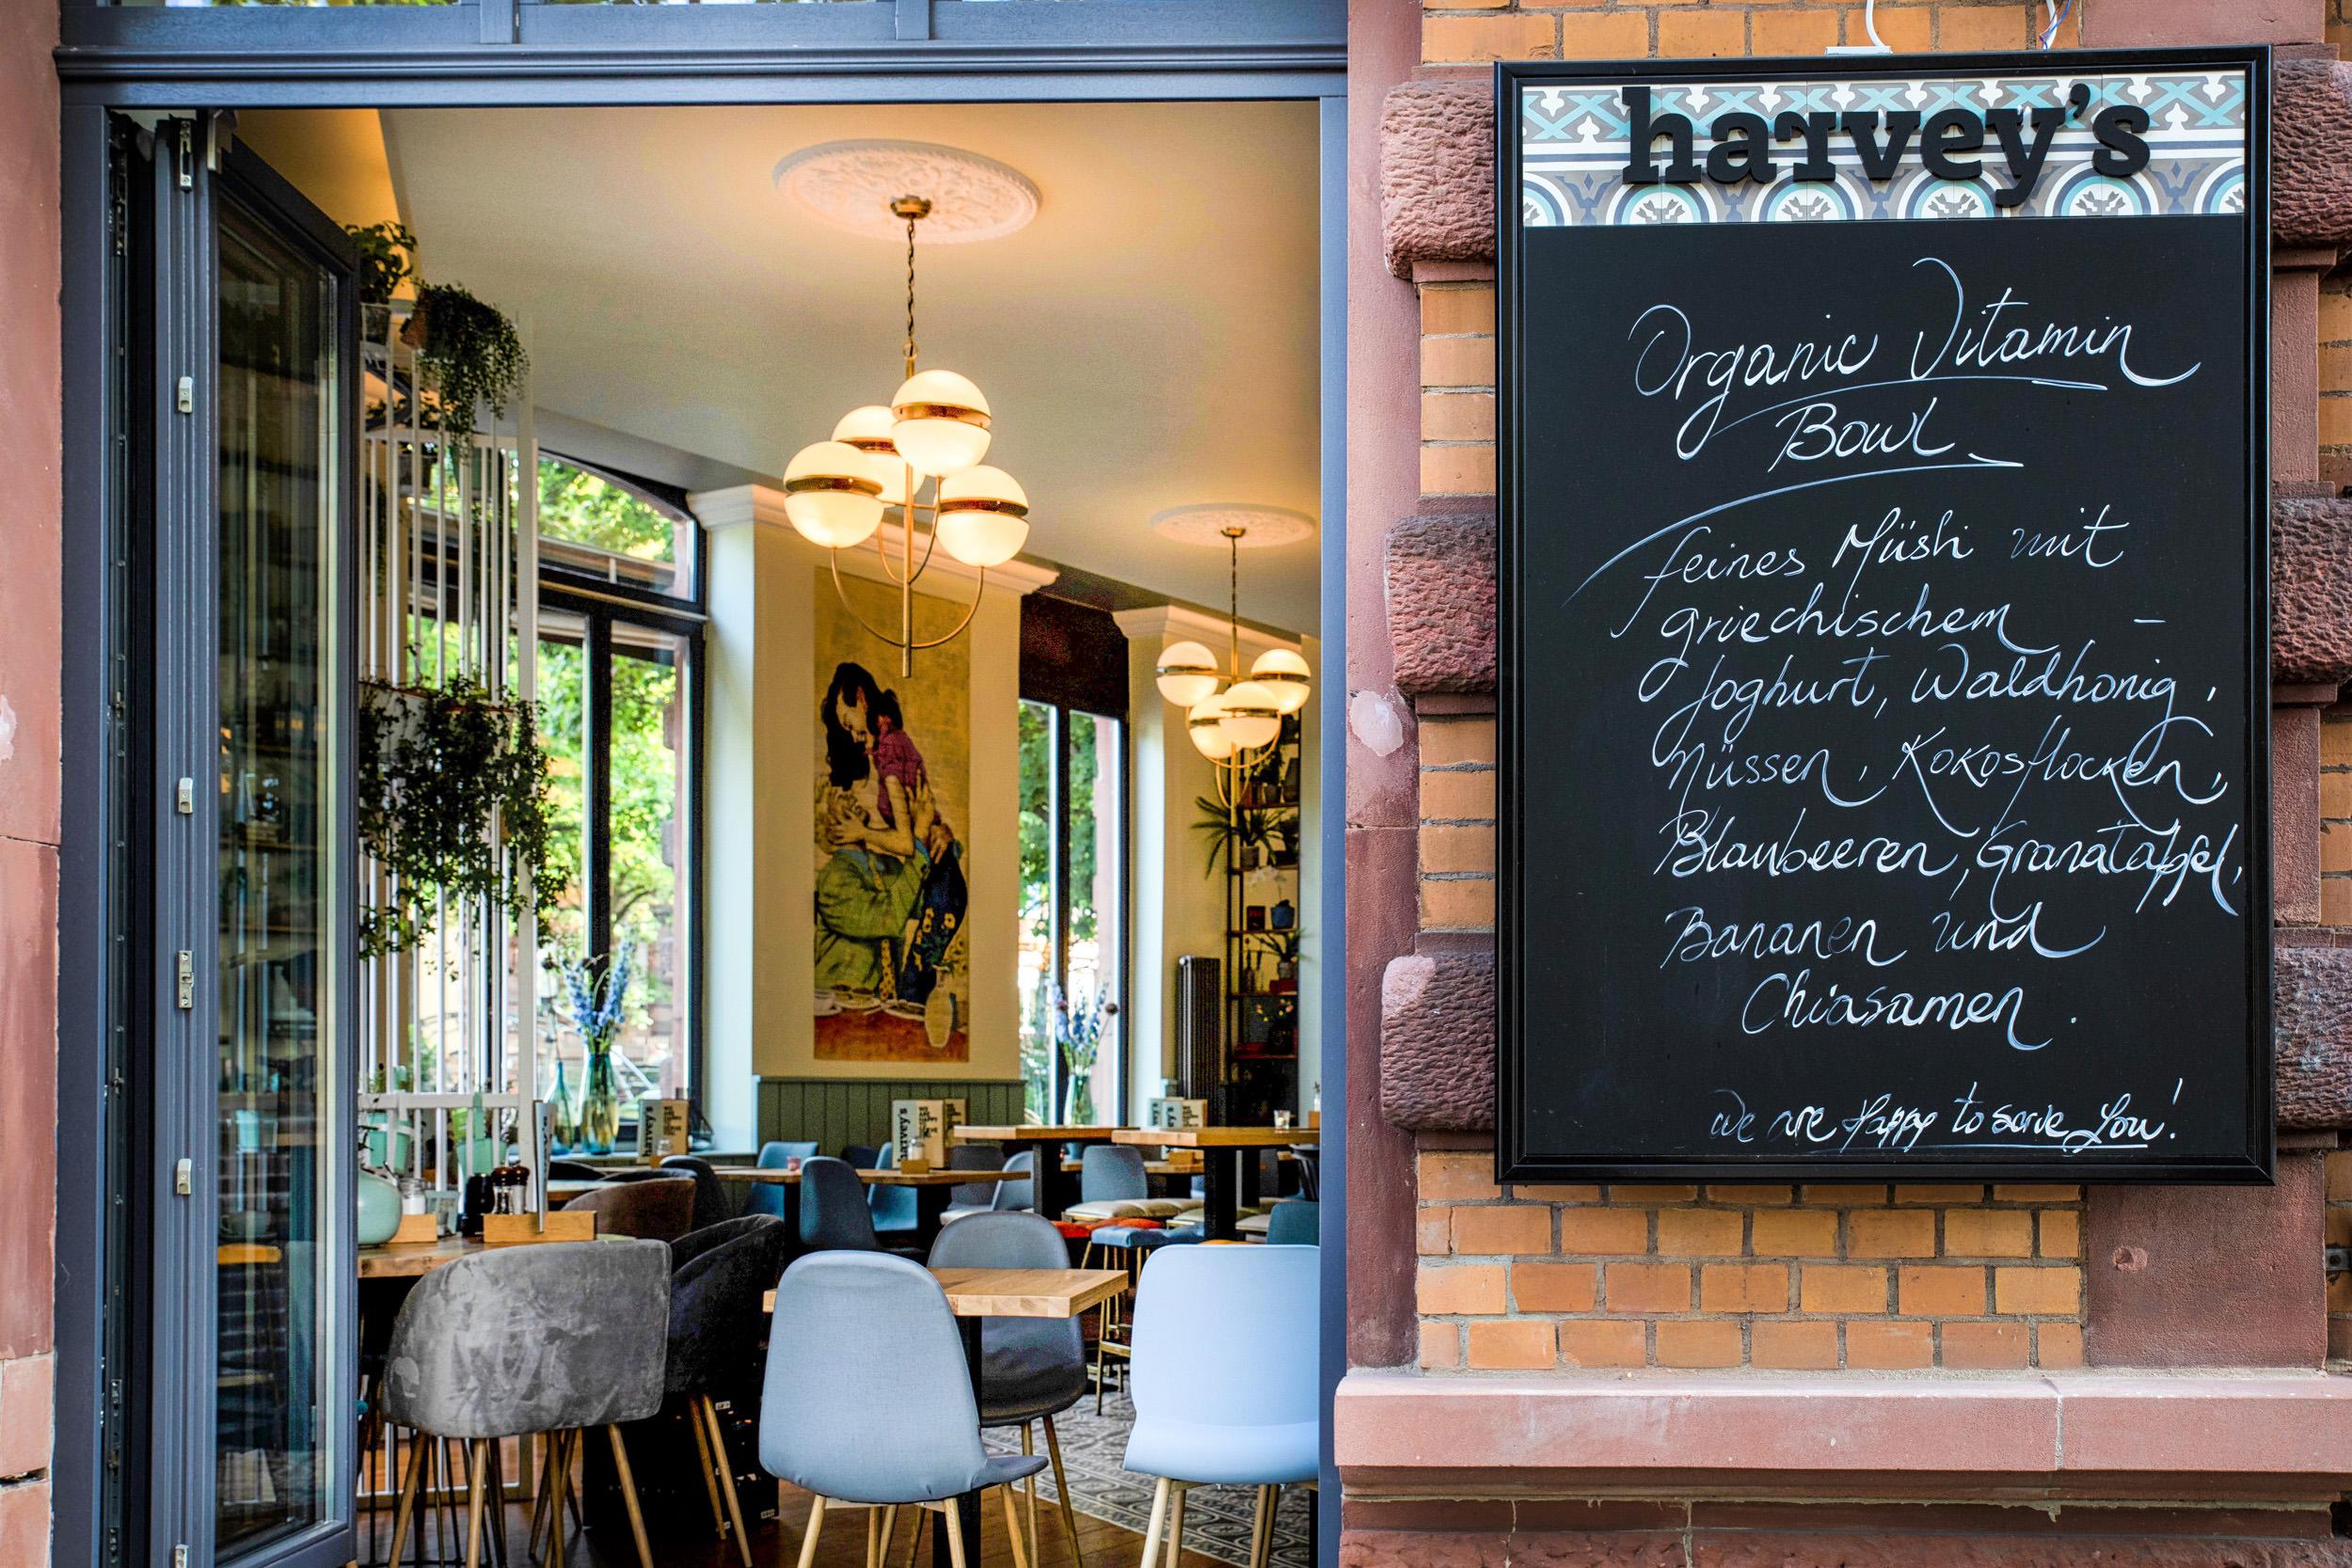 harveys 14